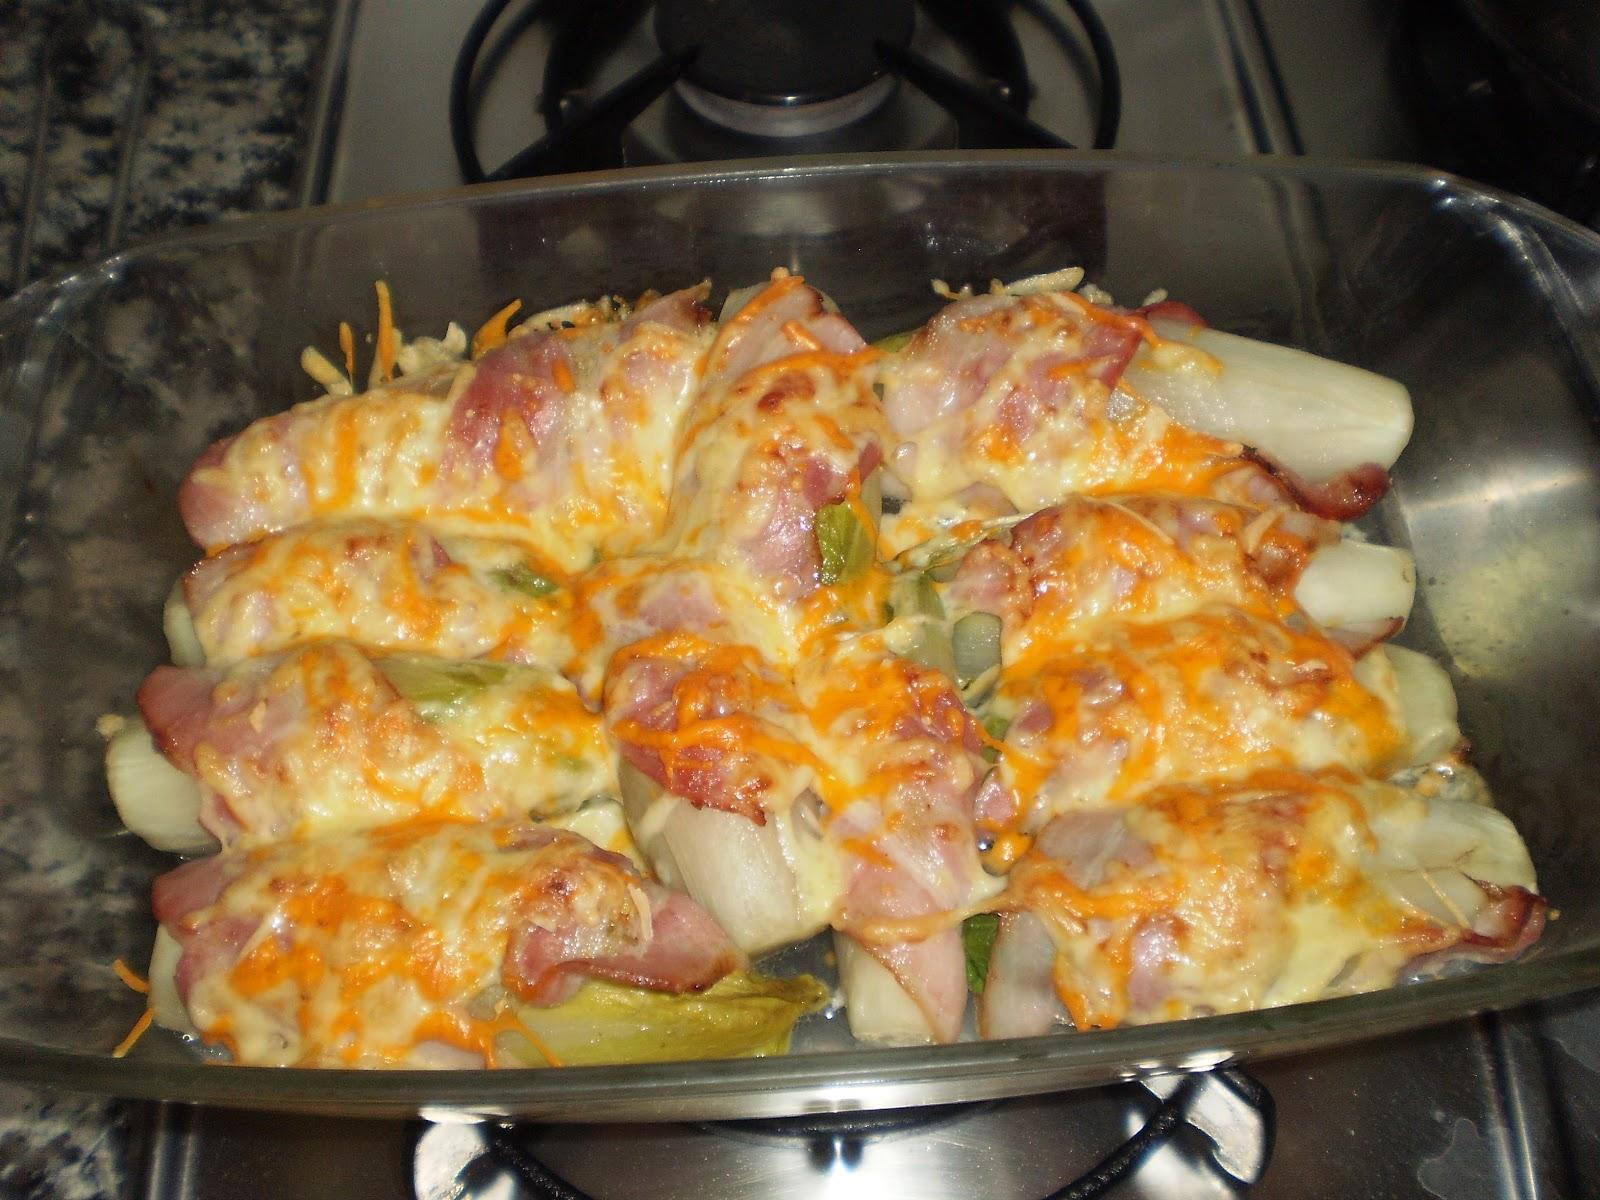 Cocina sin tonterias endivias al horno - Cocina al horno ...